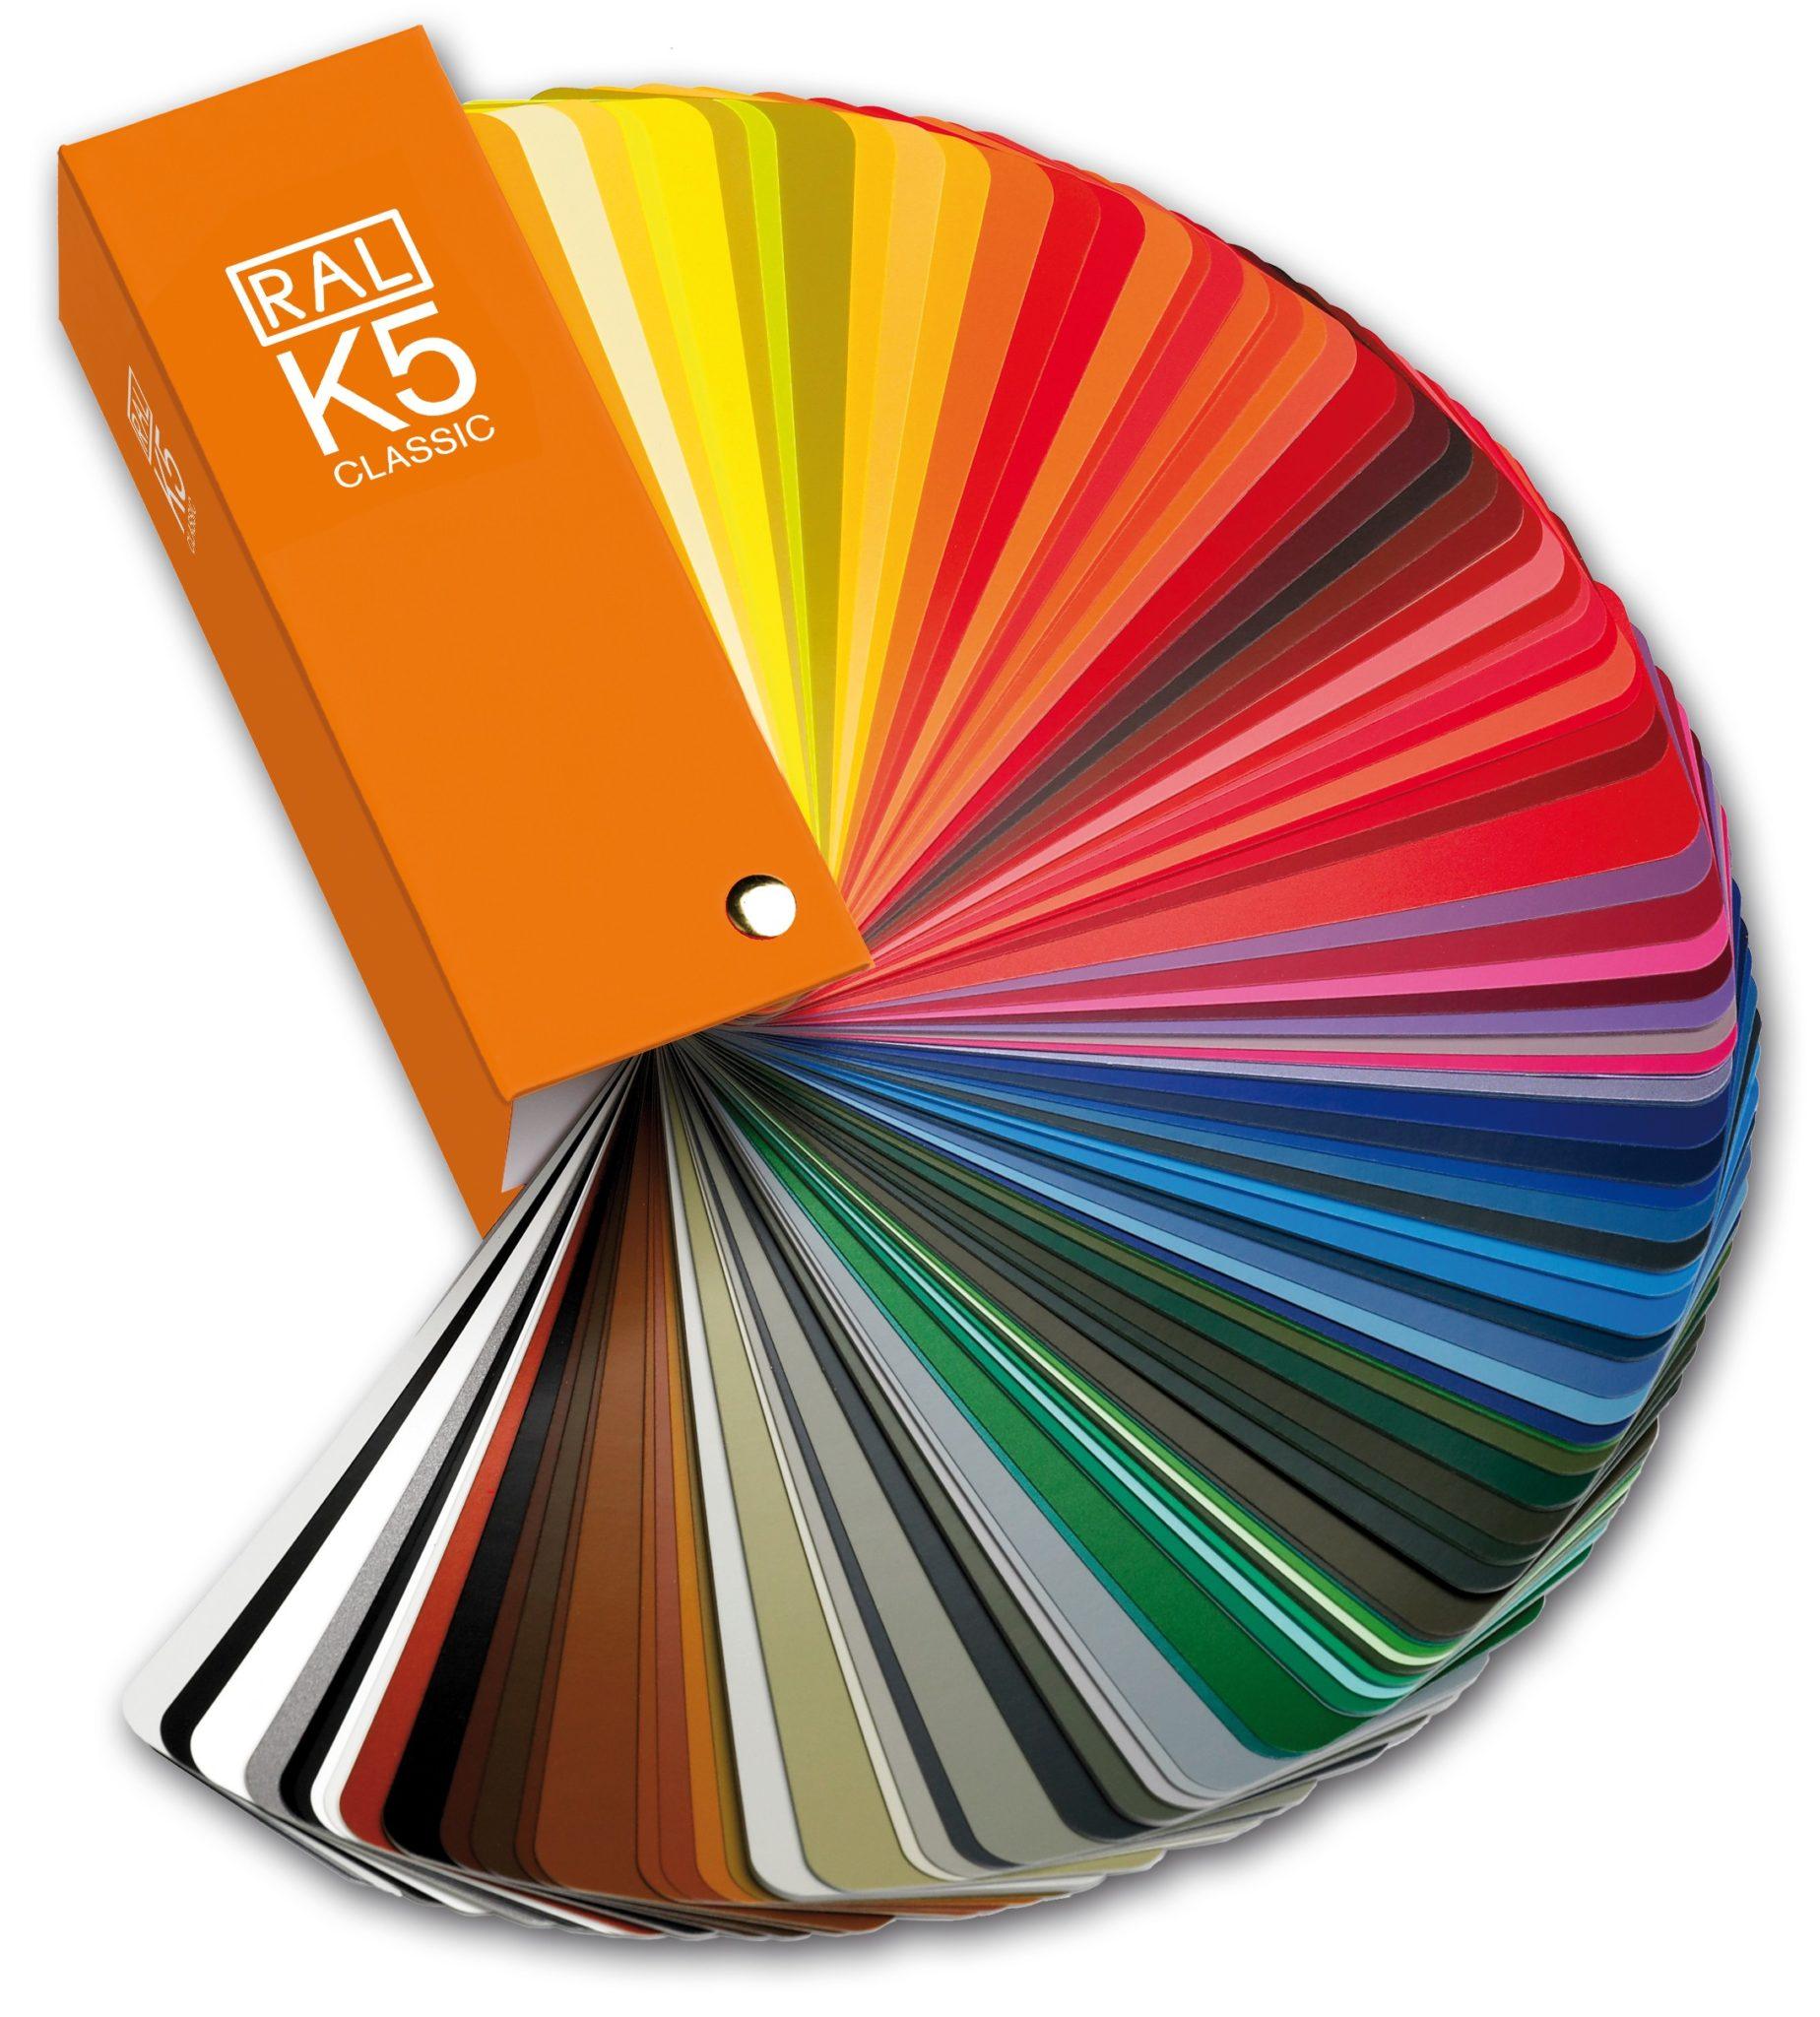 Powder Coat Paint Selector gives many choices